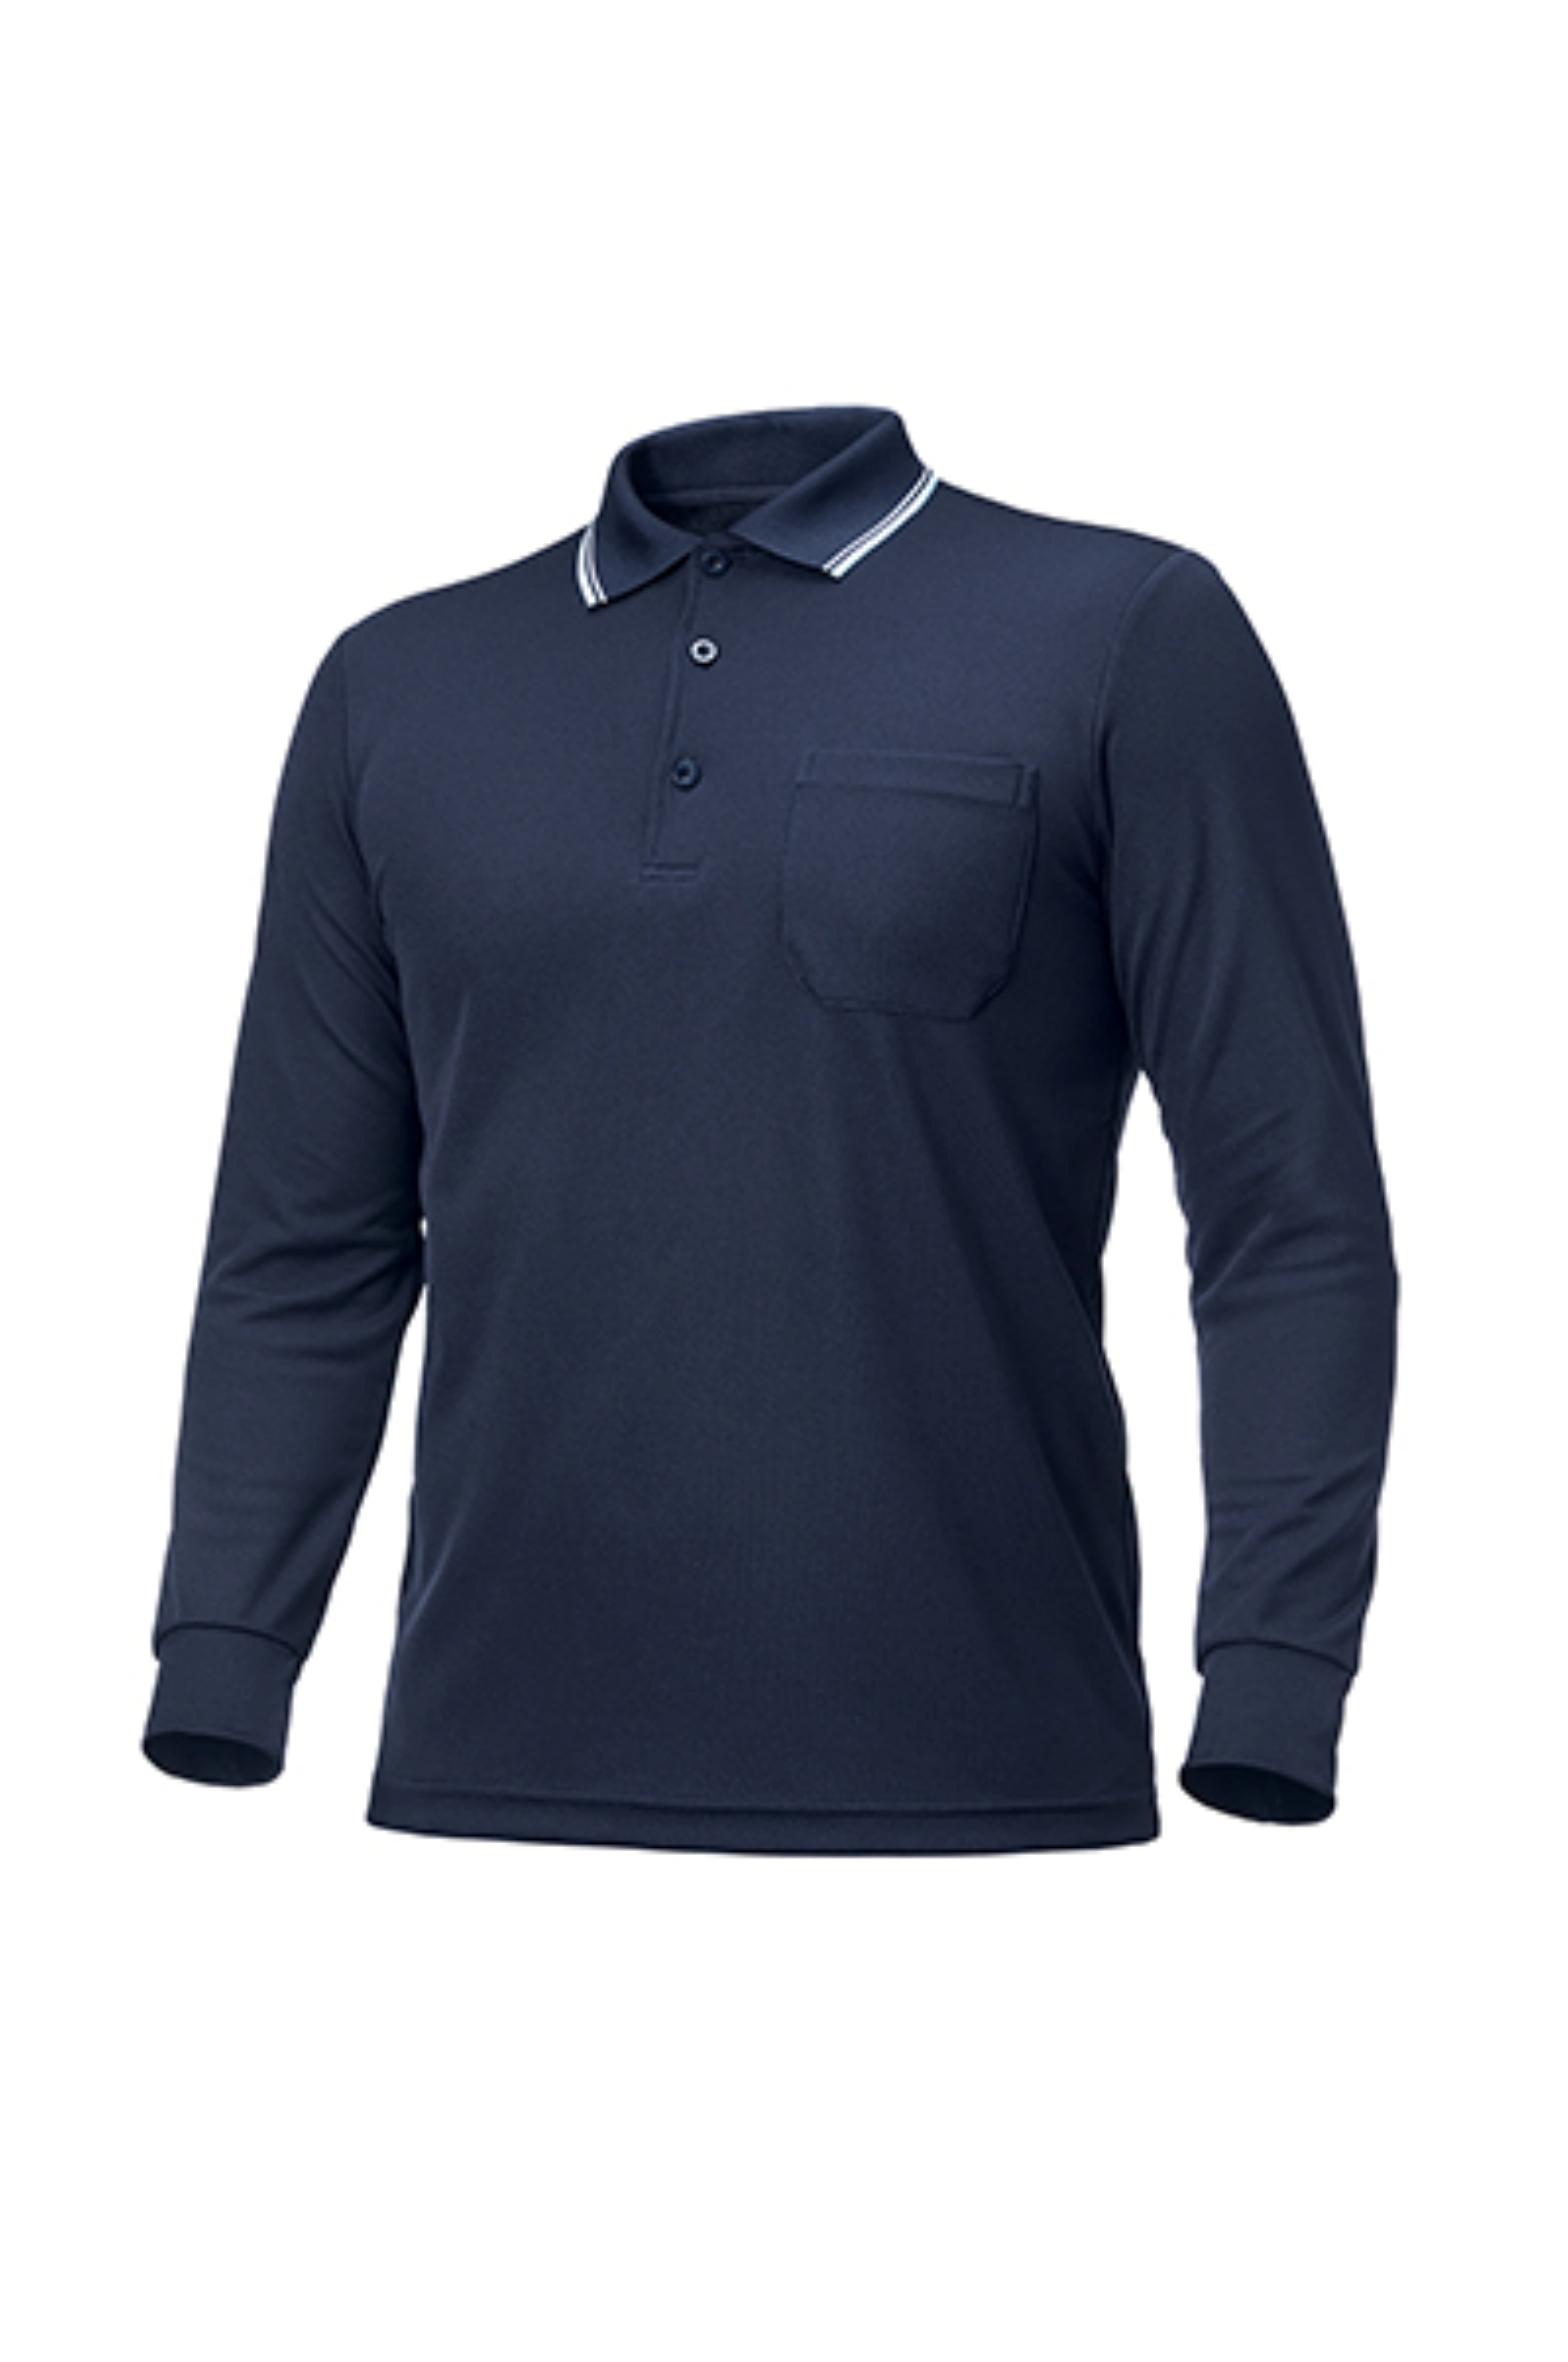 ZB-T1331 (네이비)지벤 작업복 티셔츠(쿨론)